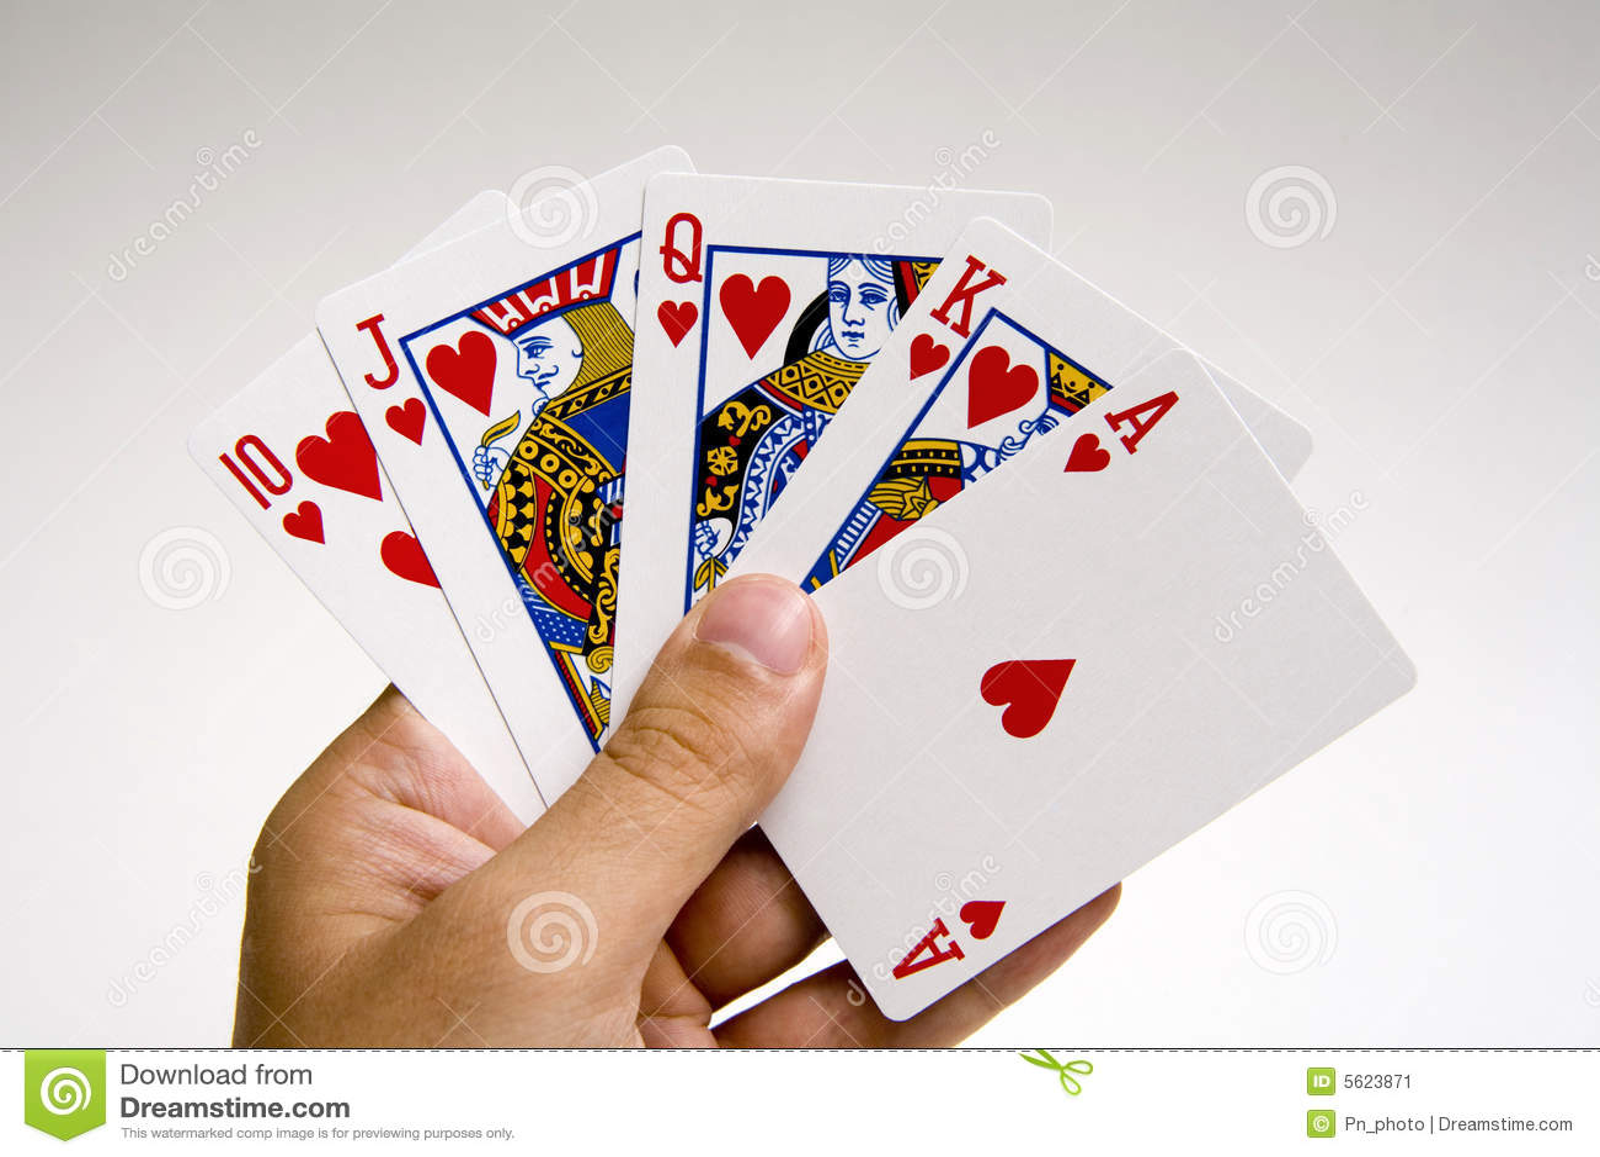 Limitless poker